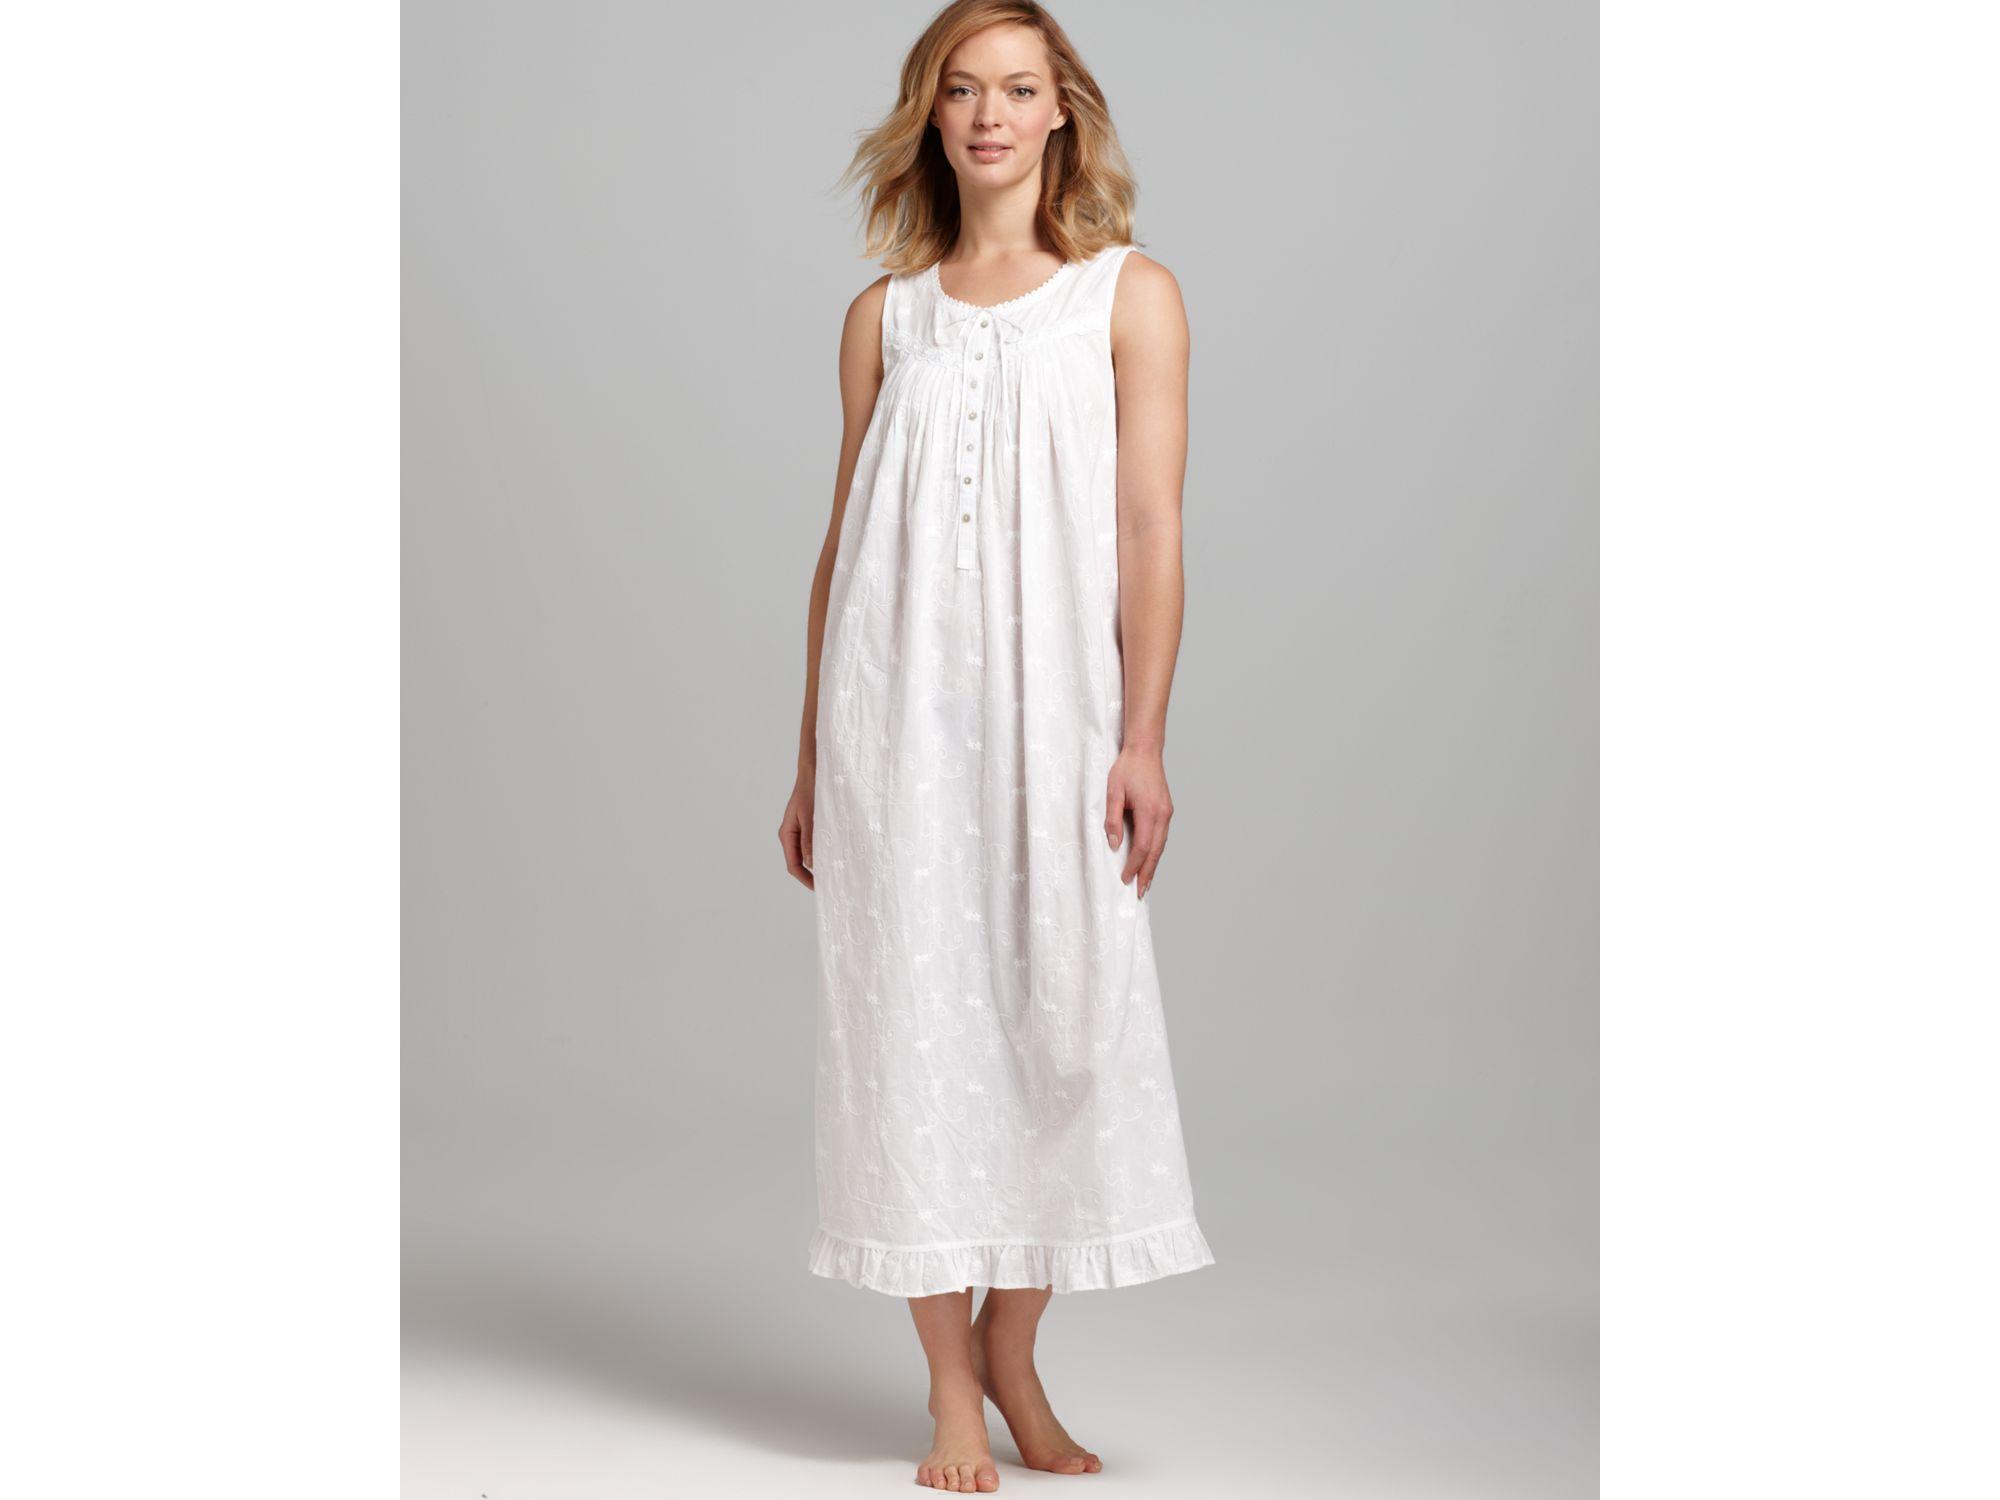 Lyst - Eileen west Breaking Waves Sleeveless Ballet Gown in White